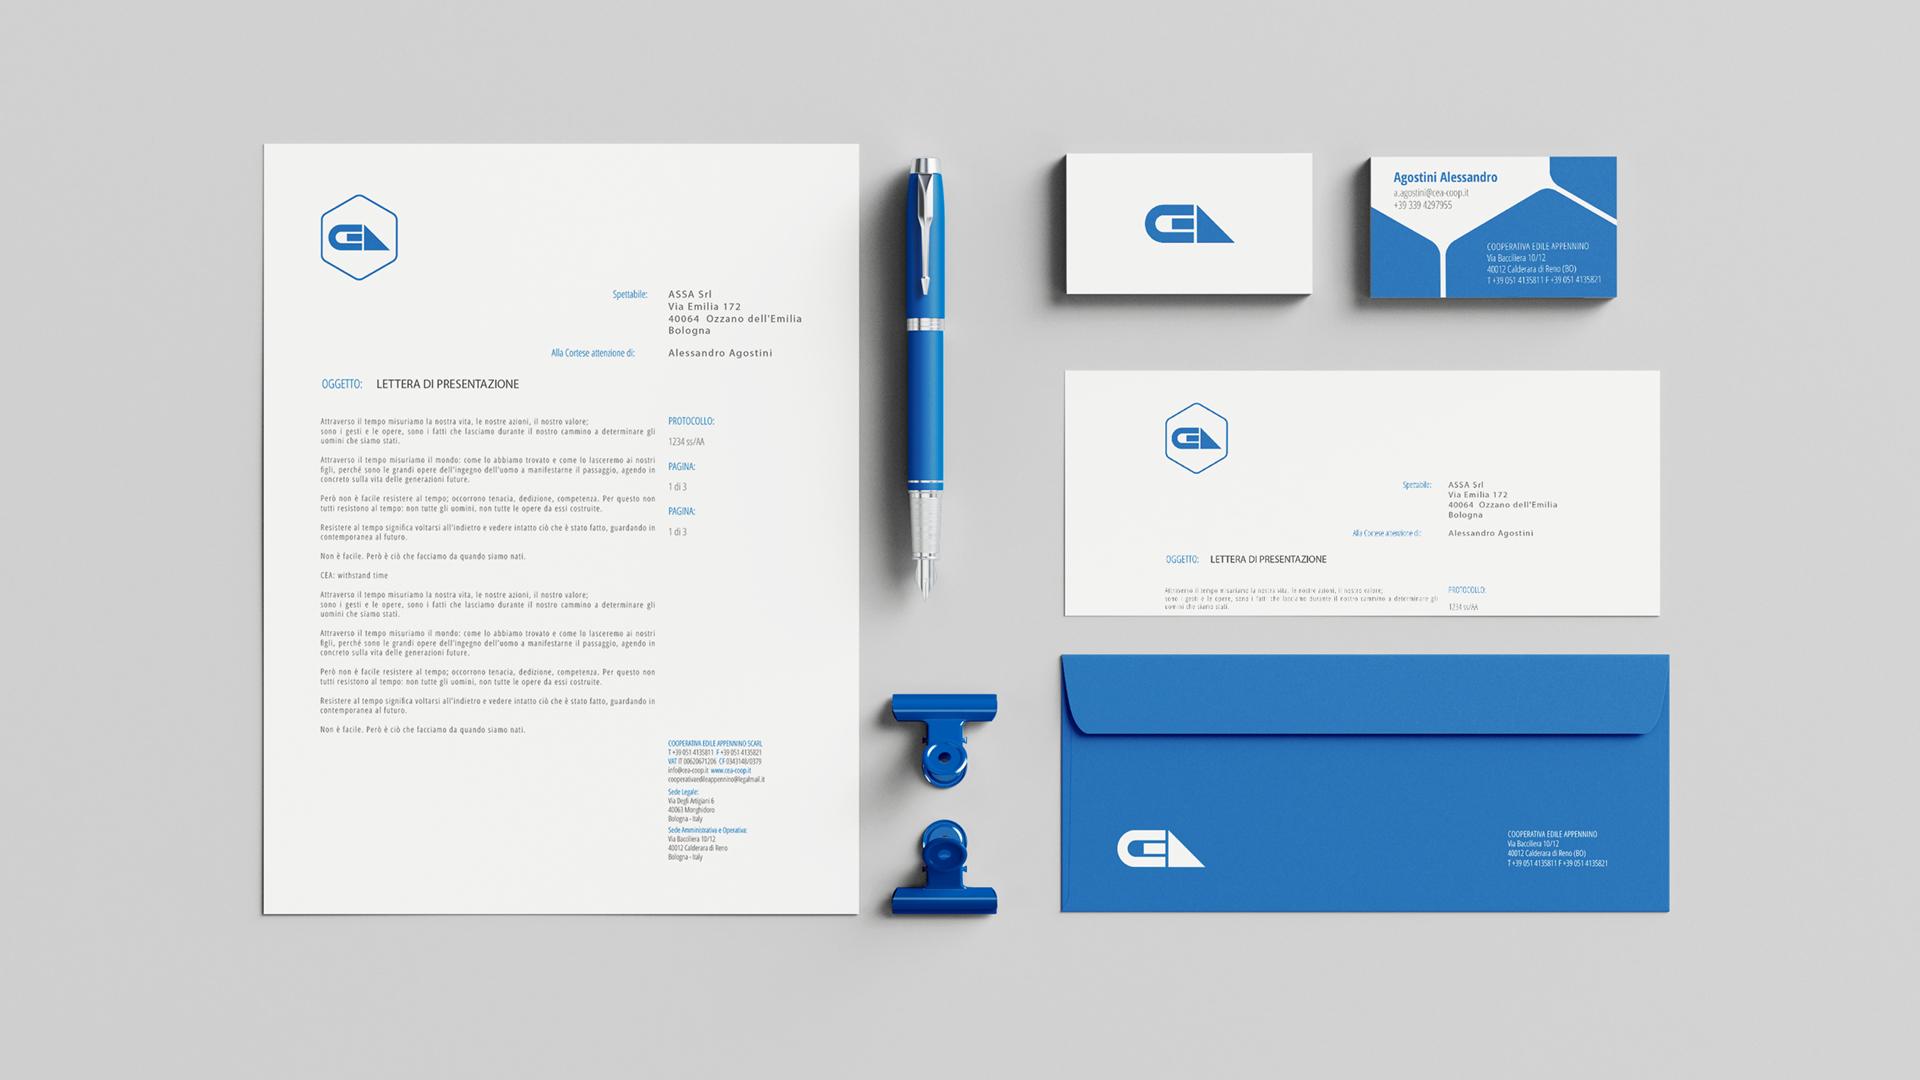 Materiale aziendale CEA Coop